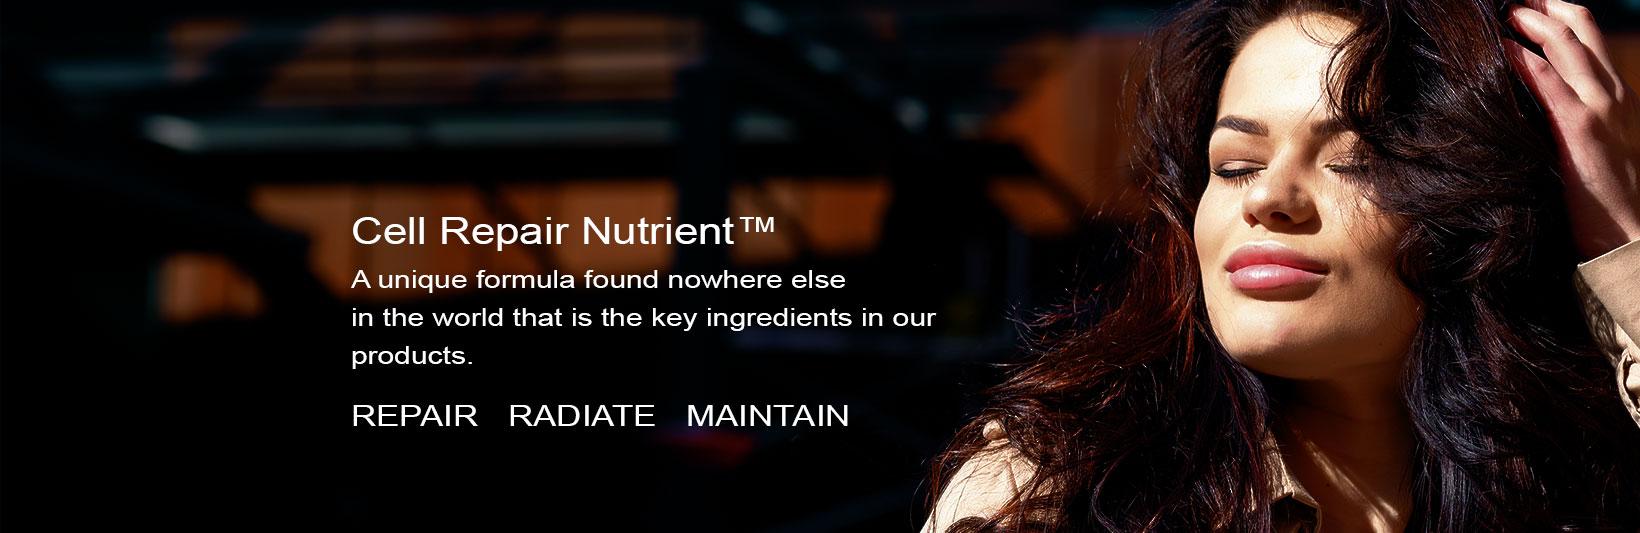 Avenoir-Beautiful-Science-Cell-Repair-Nutrient